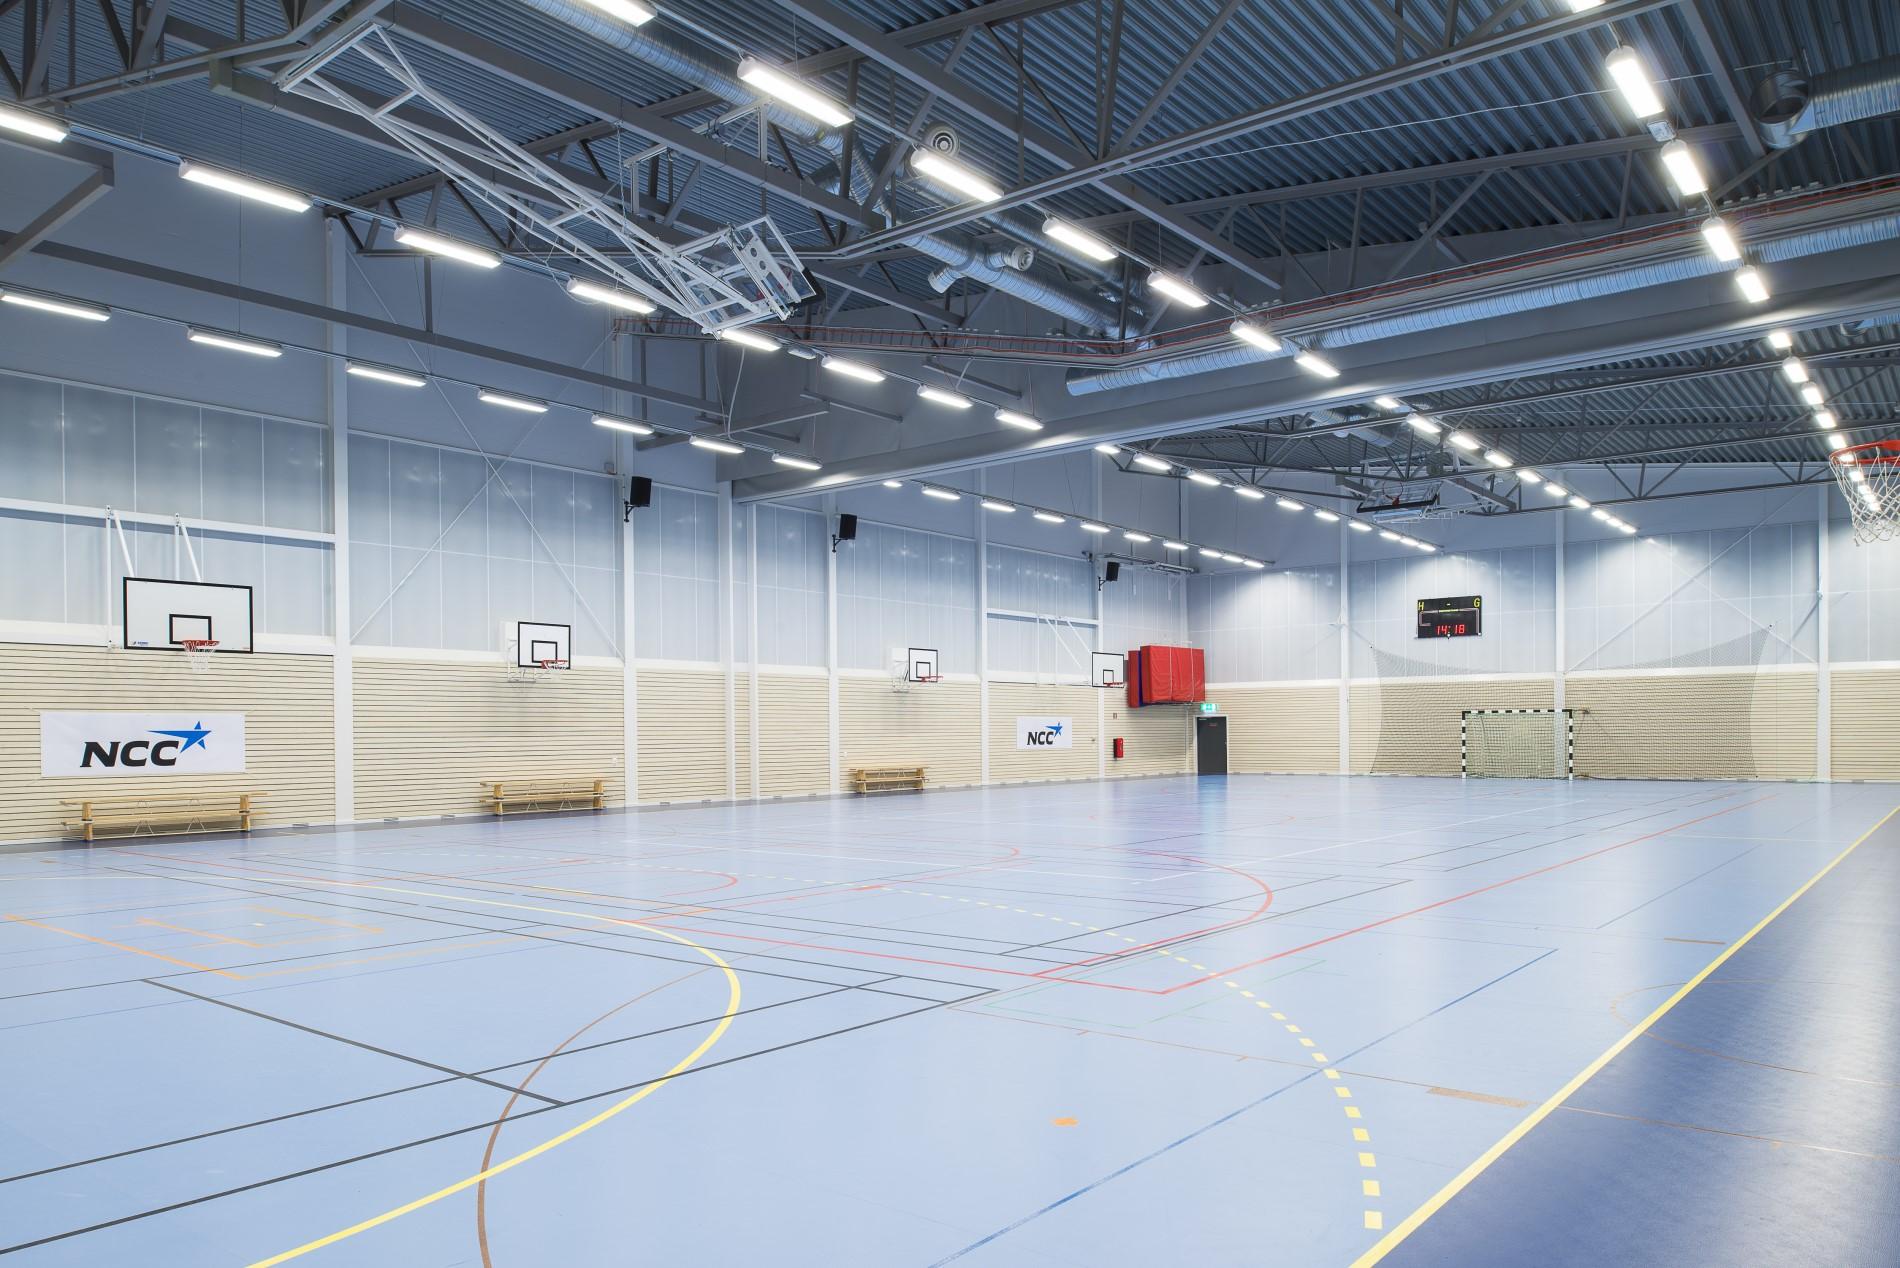 mörby idrottshall sportgolv sporthallsinredning unisport